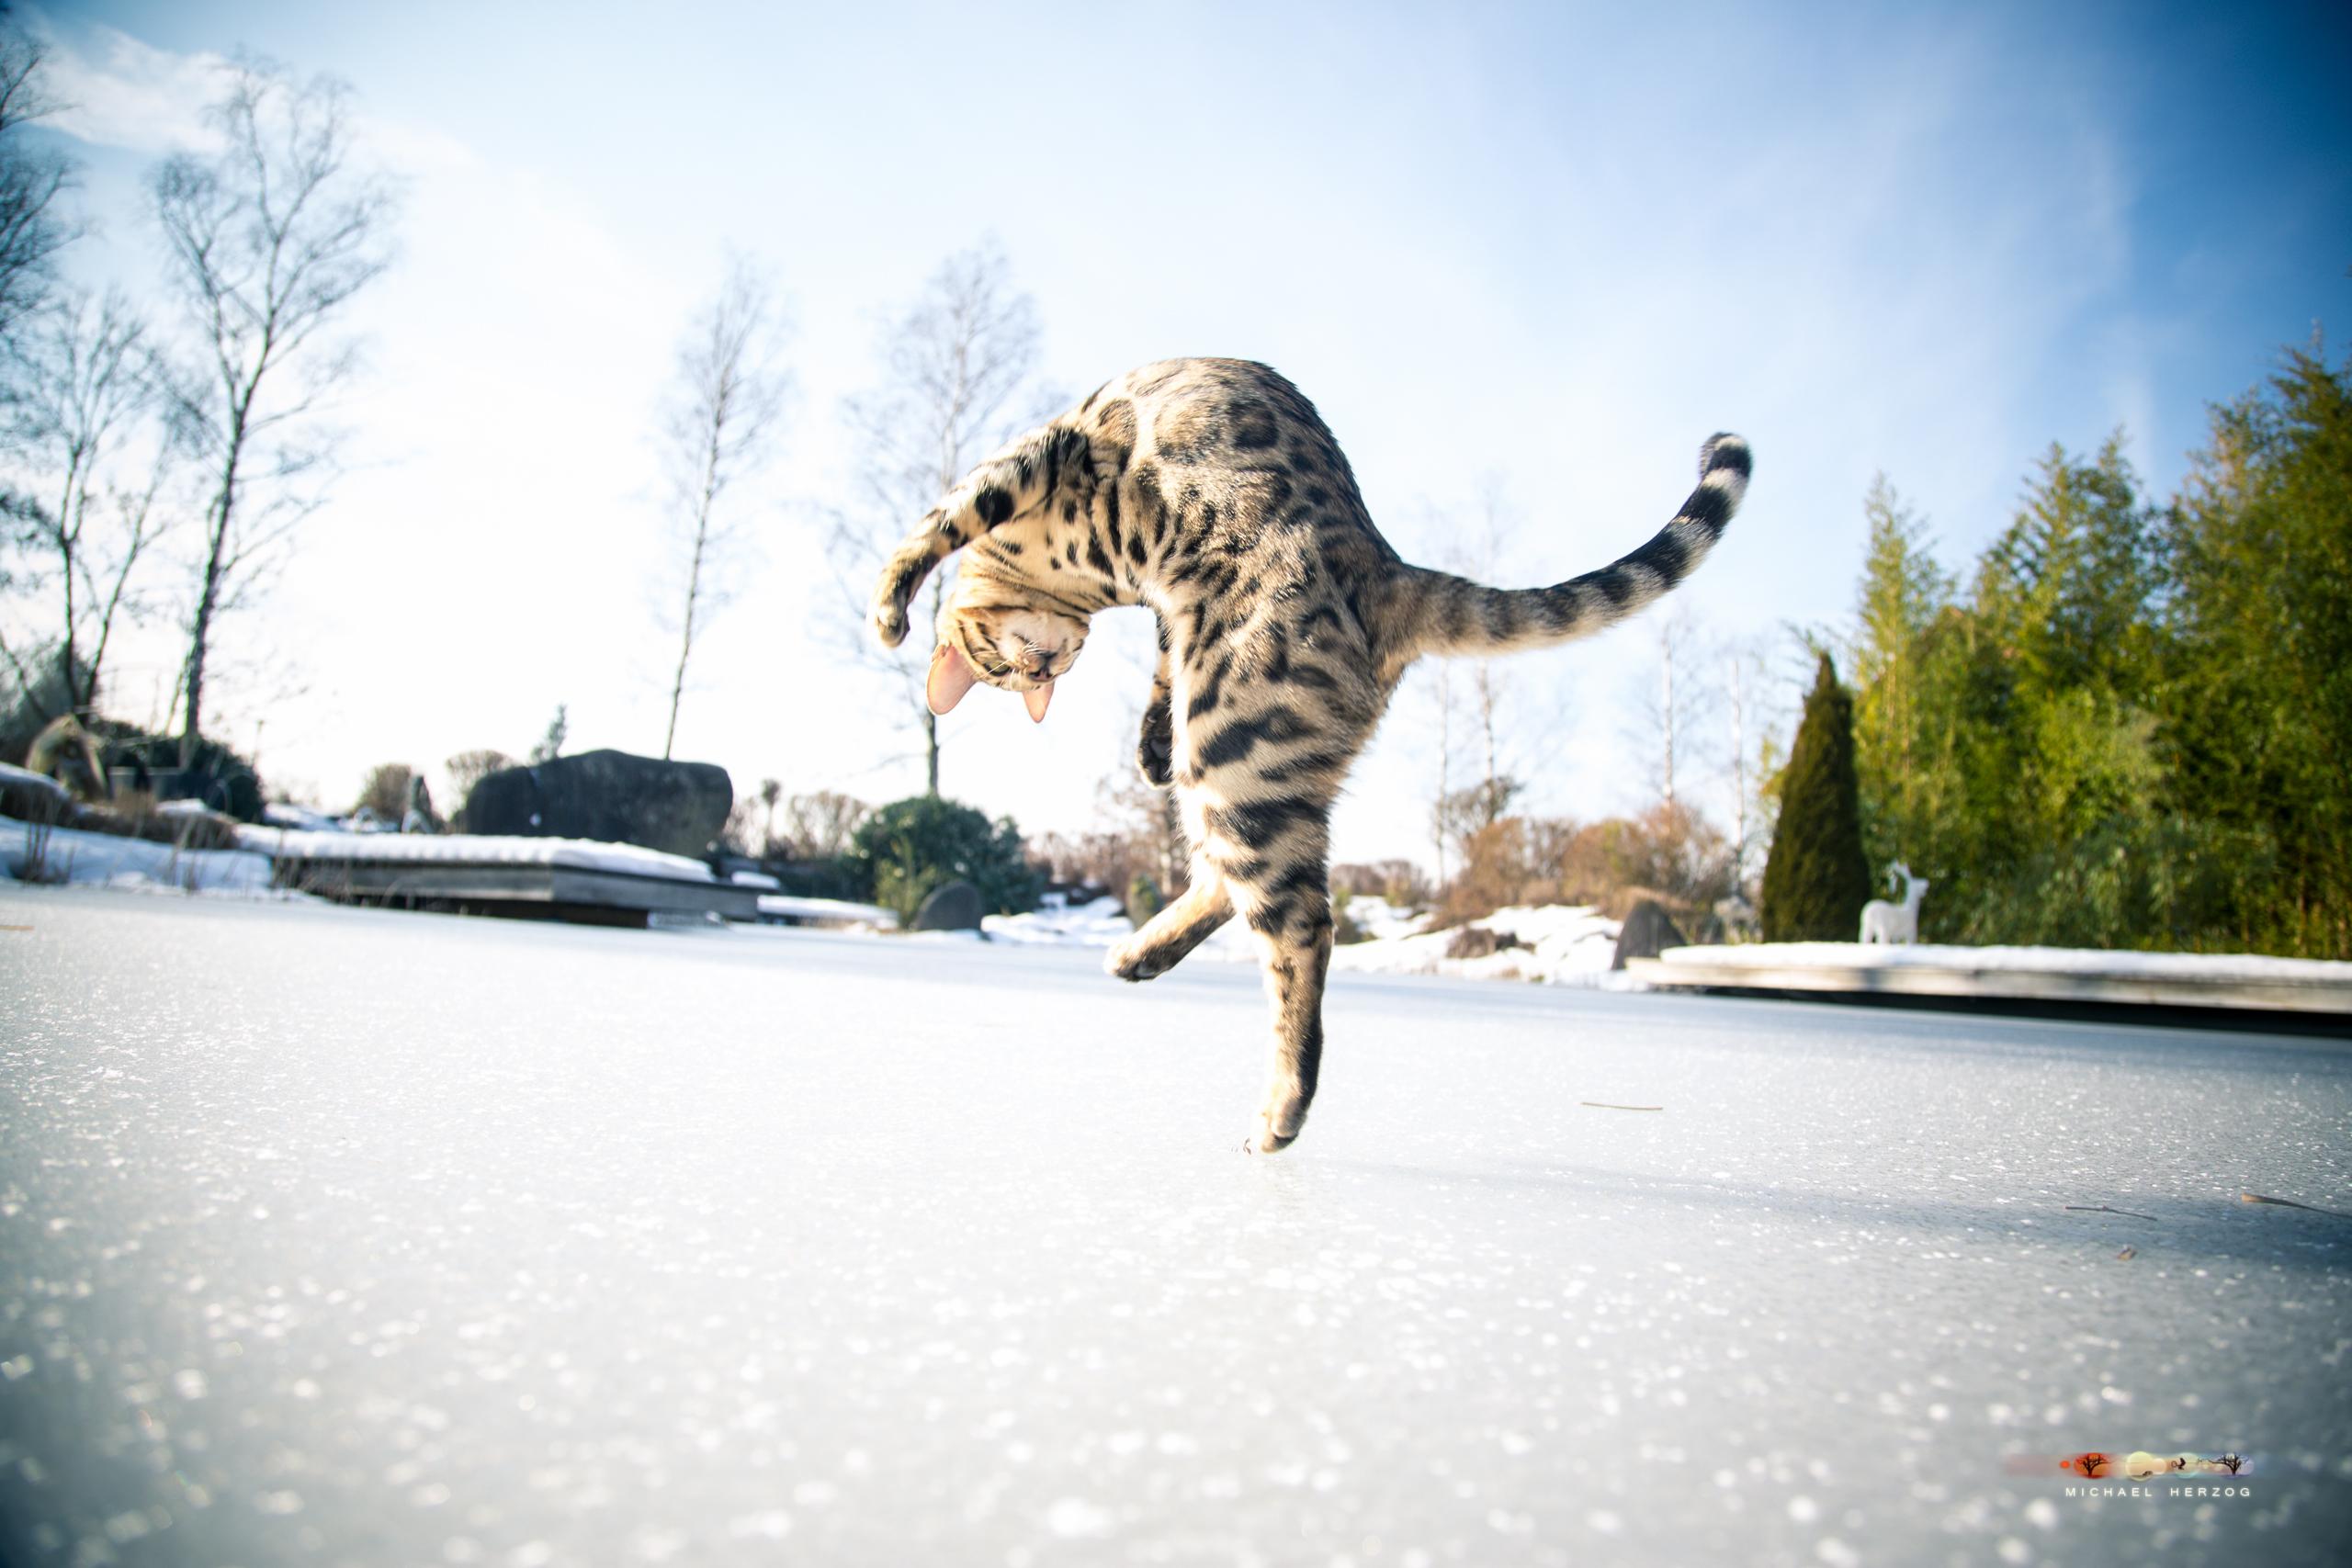 BALUARI_Winter2019_Garten_MichaelHerzog-8960.jpg